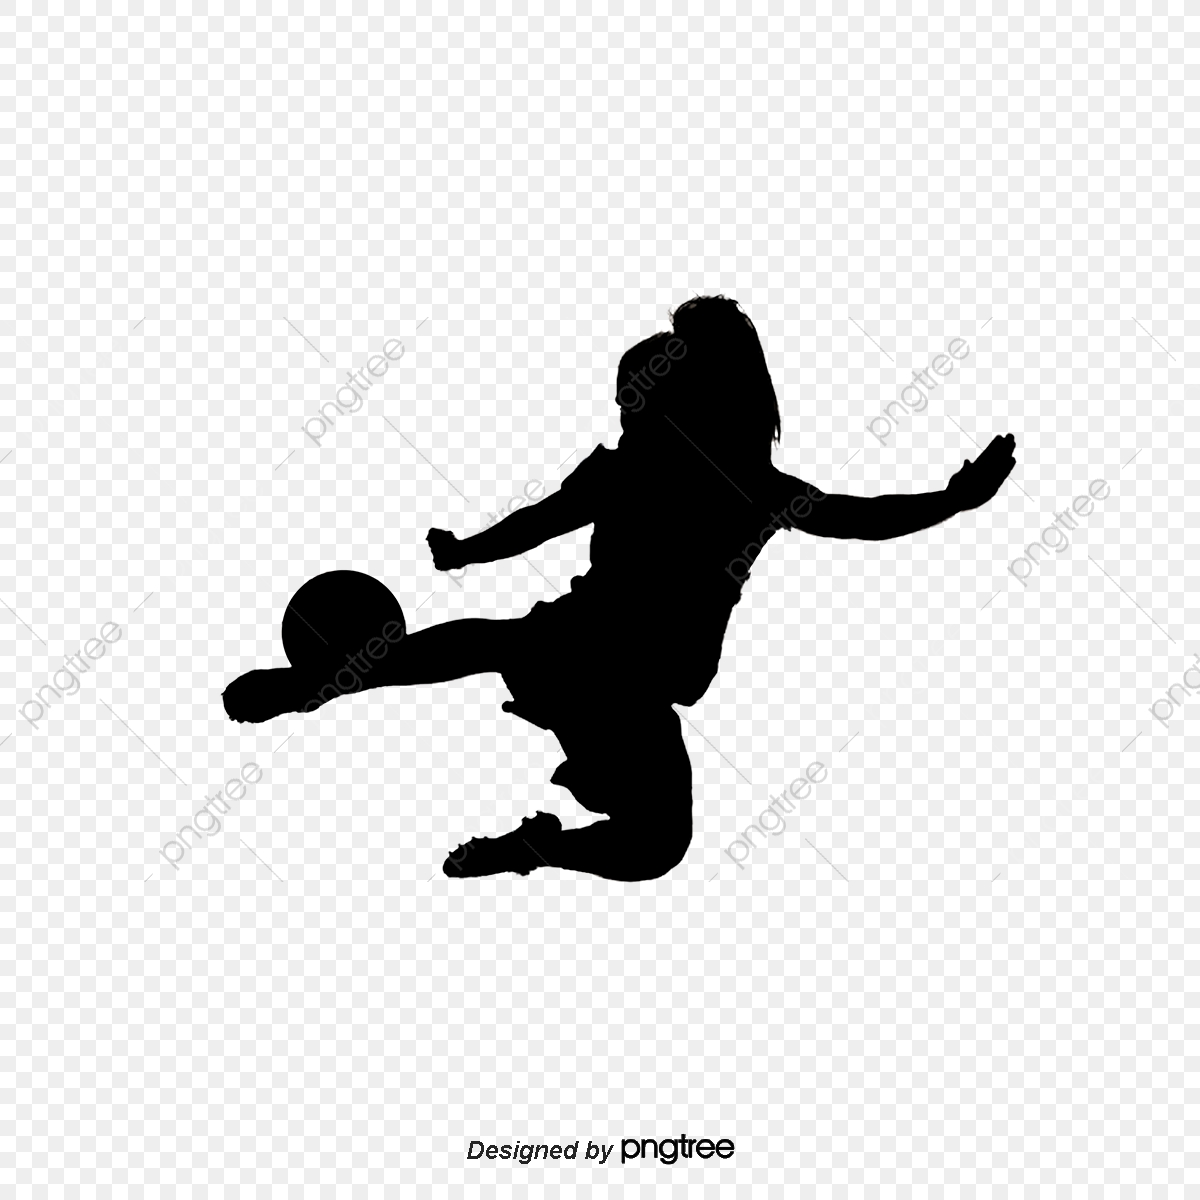 Wanita Pemain Sepak Bola Bayang Bayang Wanita Wanita Fail